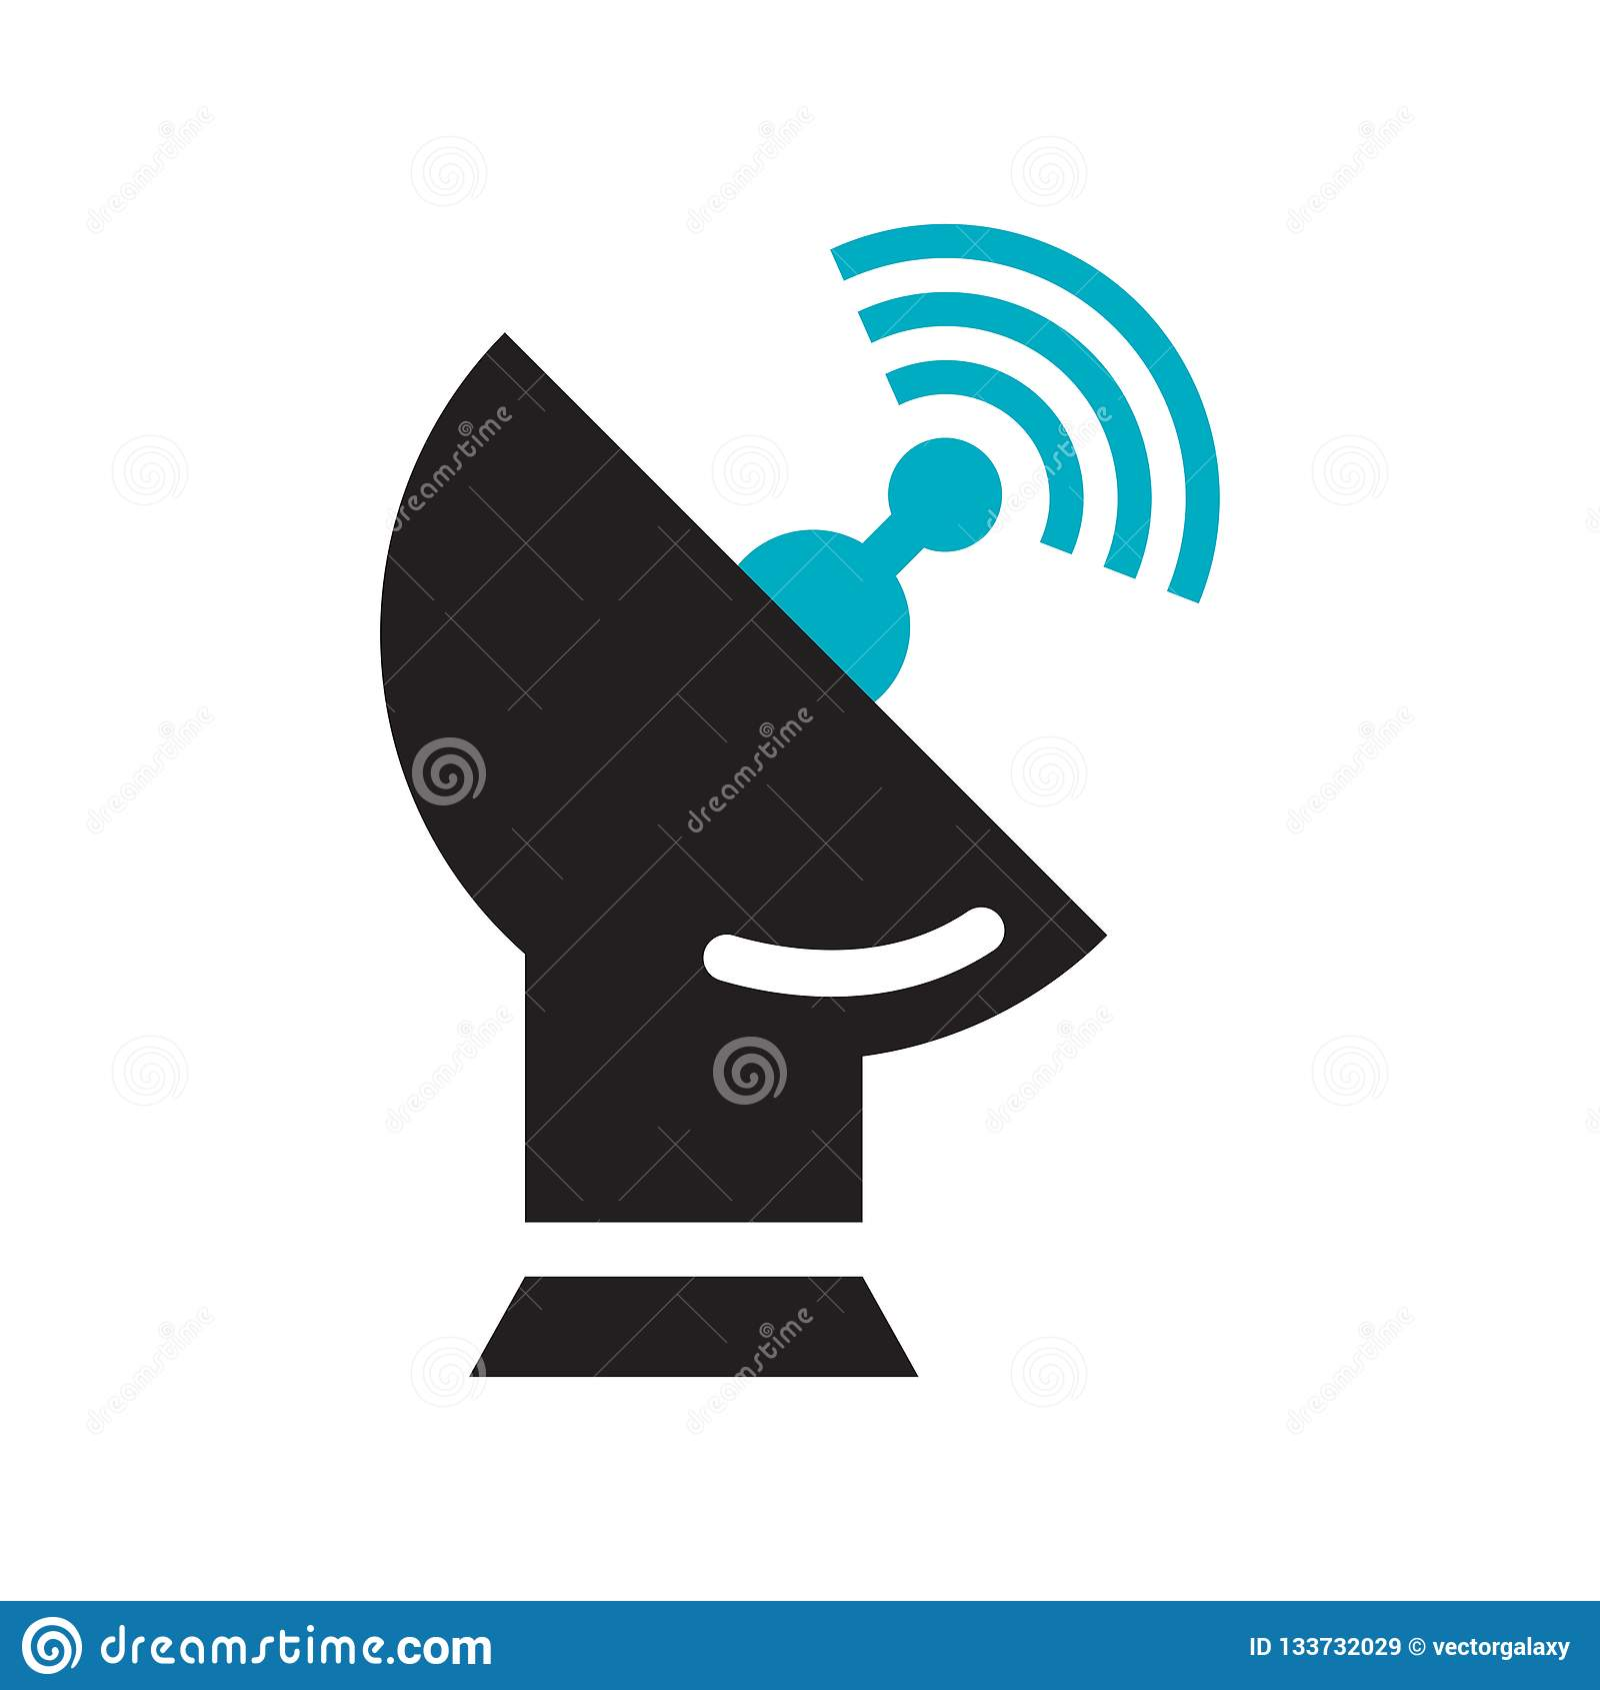 Satelite antenna icon vector sign and symbol isolated on white background, Satelite antenna logo concept